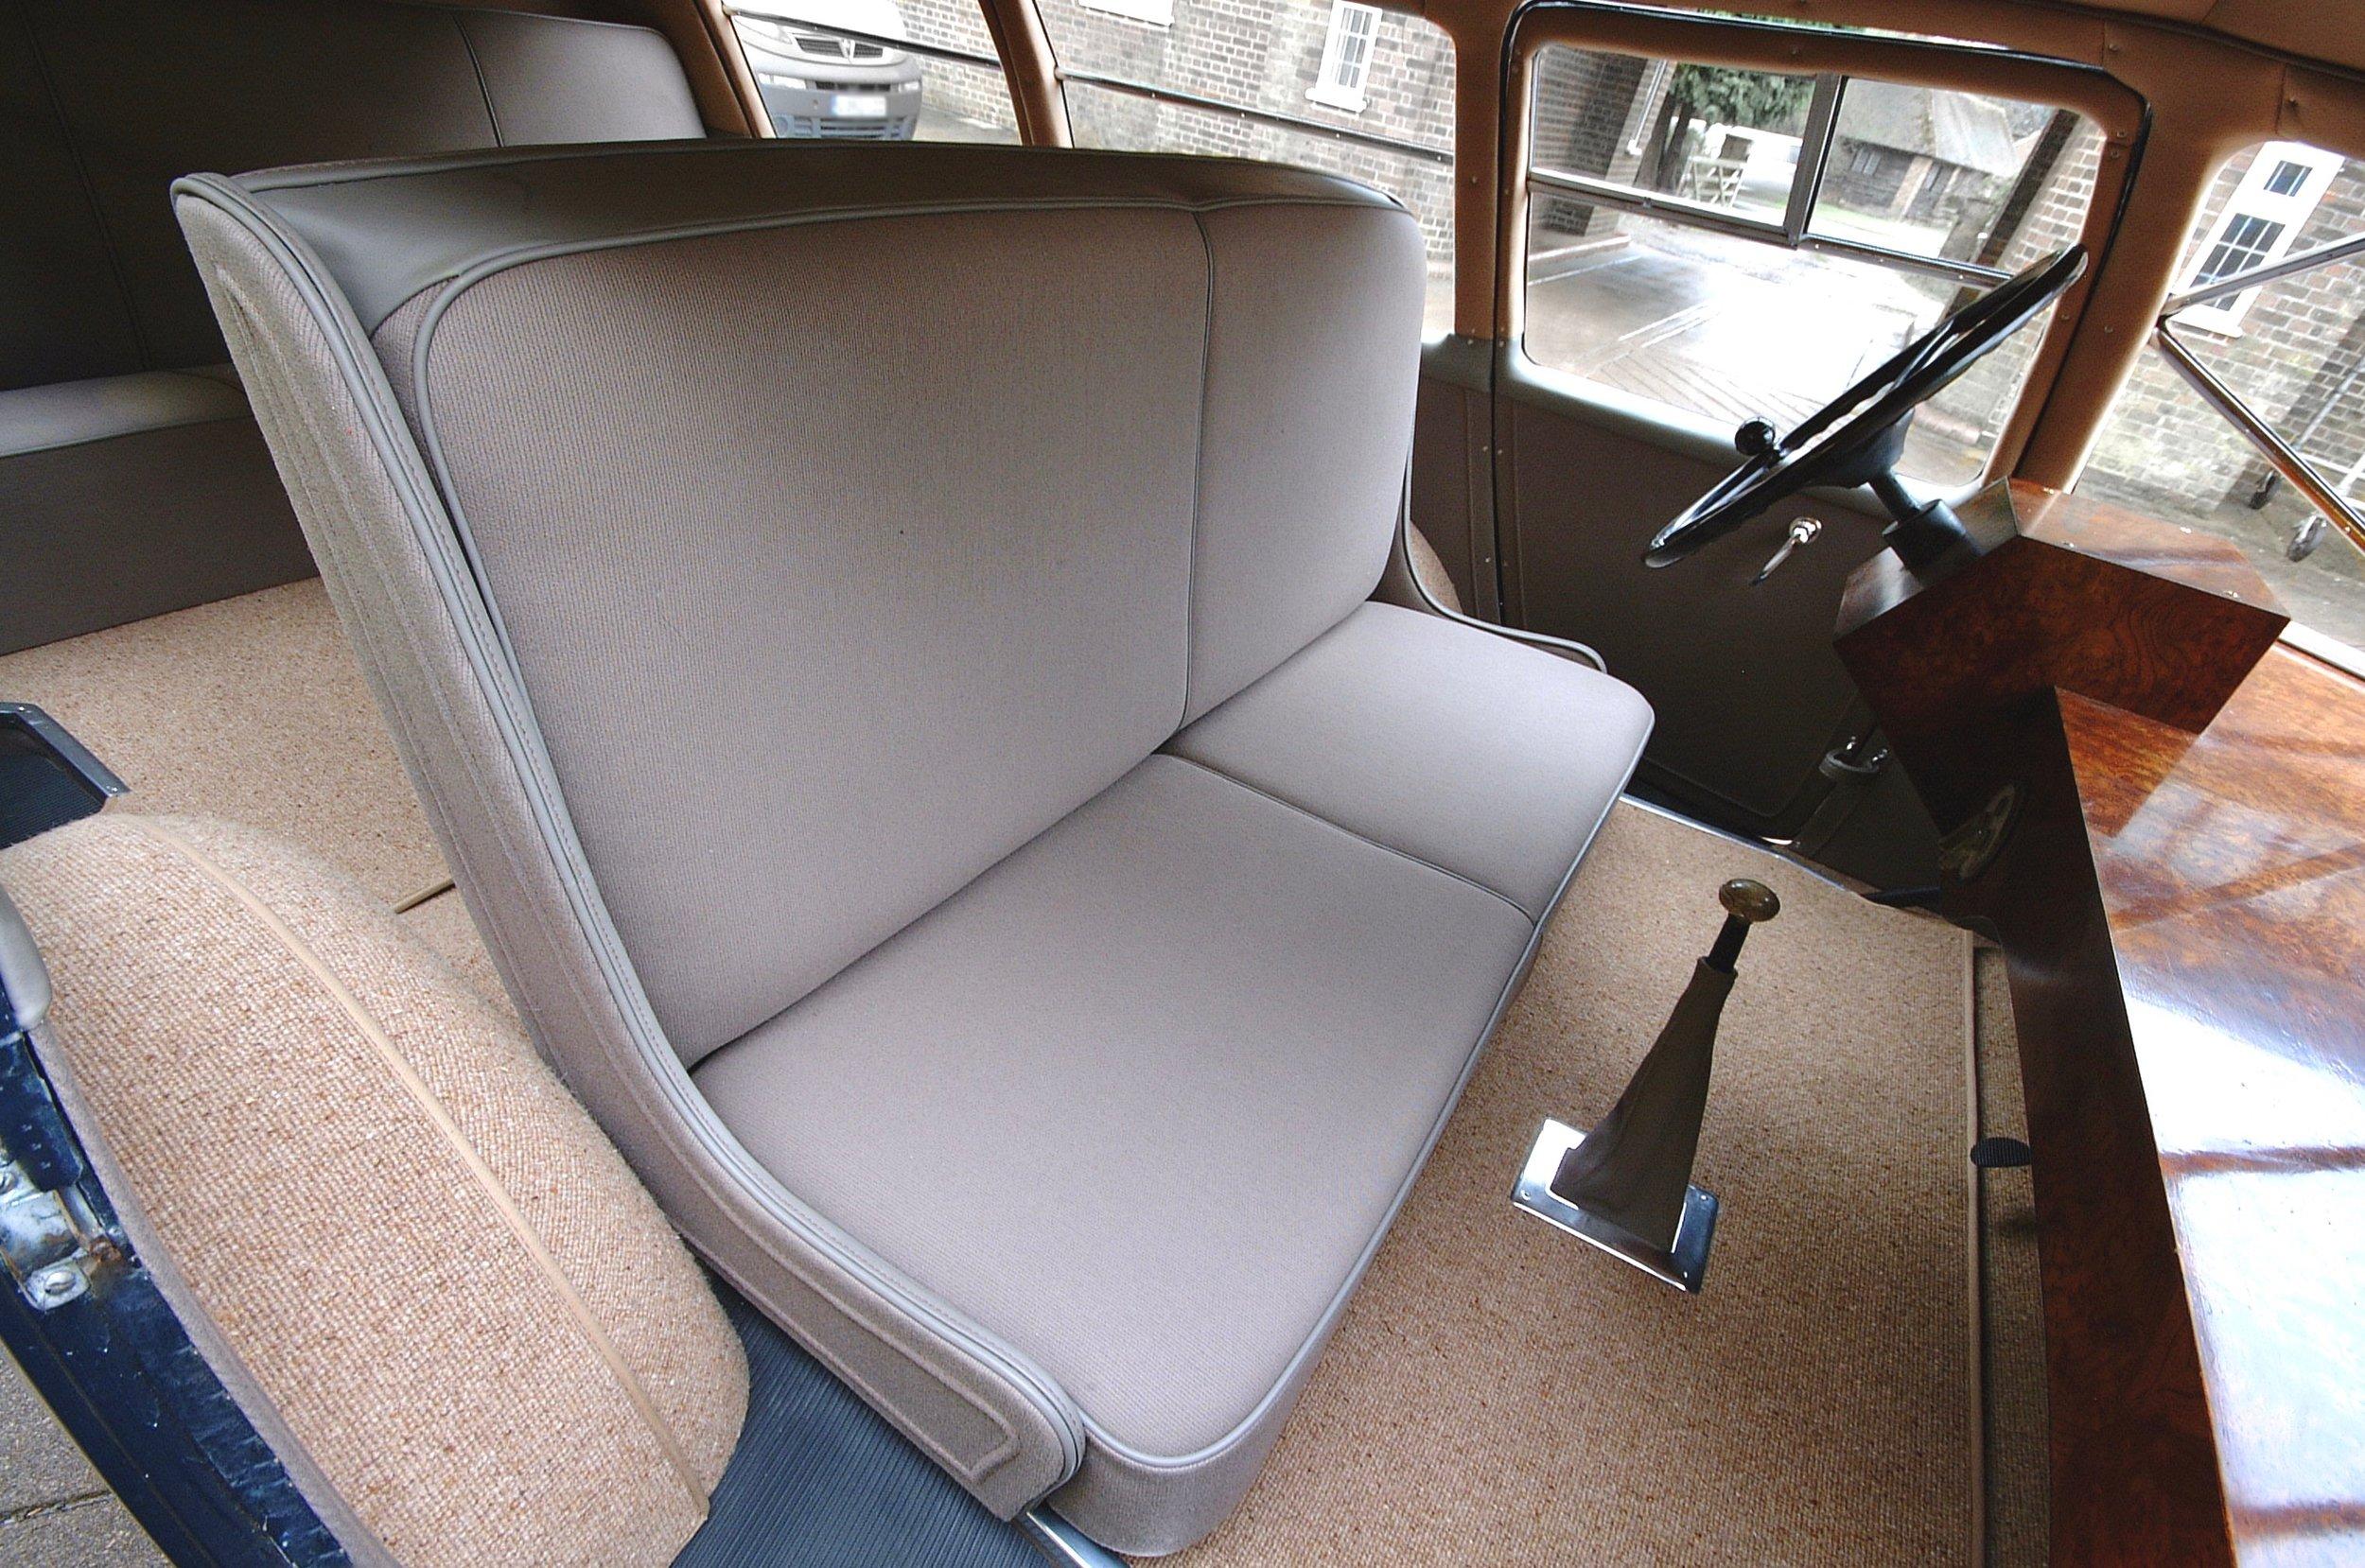 Car 2's new interior